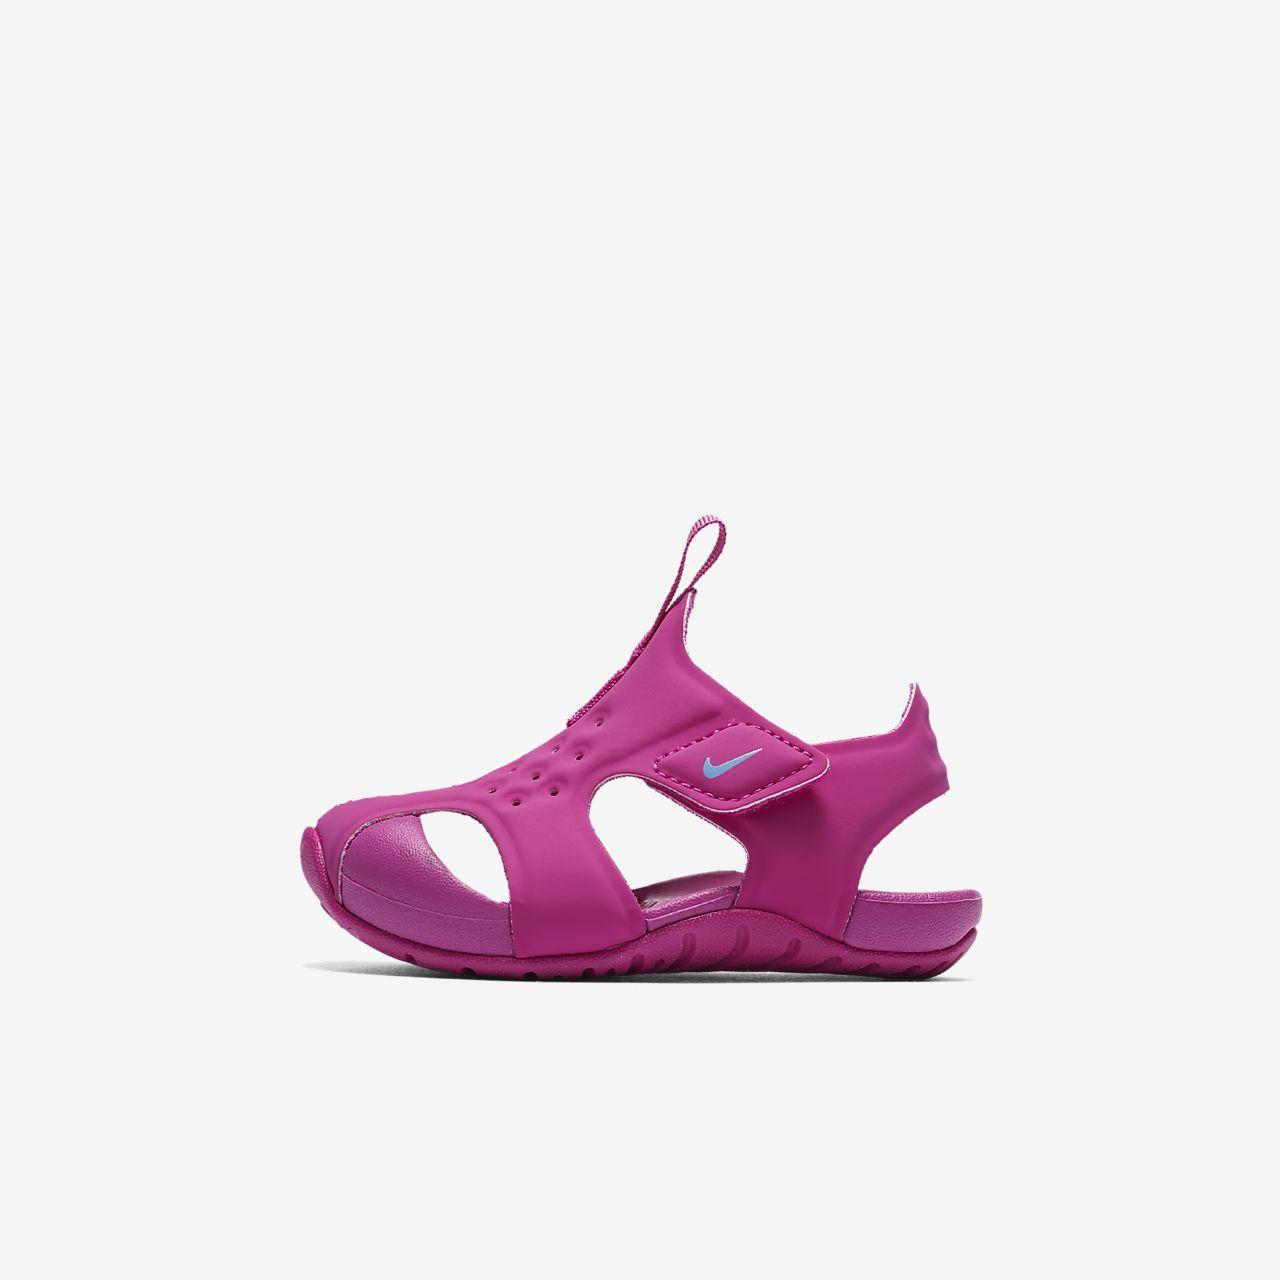 1abebdf45a3b Nike Sunray Protect 2 Baby   Toddler Shoe. Nike.com MY